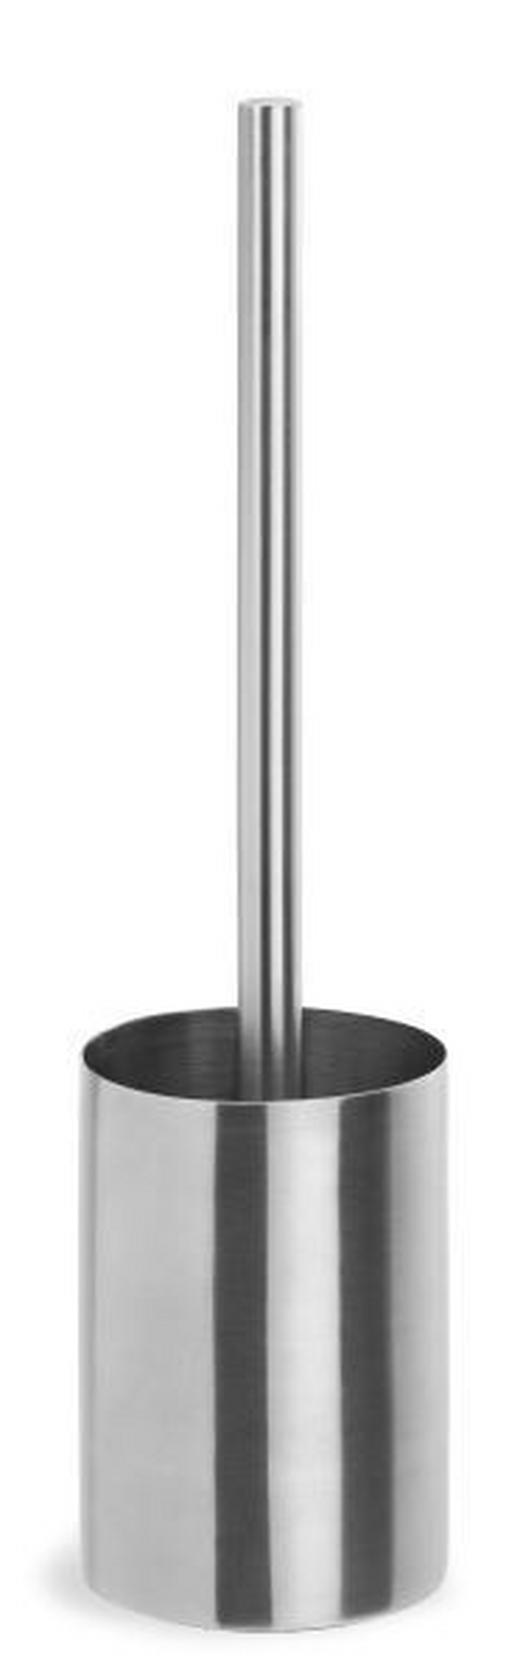 WC-BÜRSTENGARNITUR - Edelstahlfarben, Basics, Kunststoff/Metall (9/35cm) - Blomus